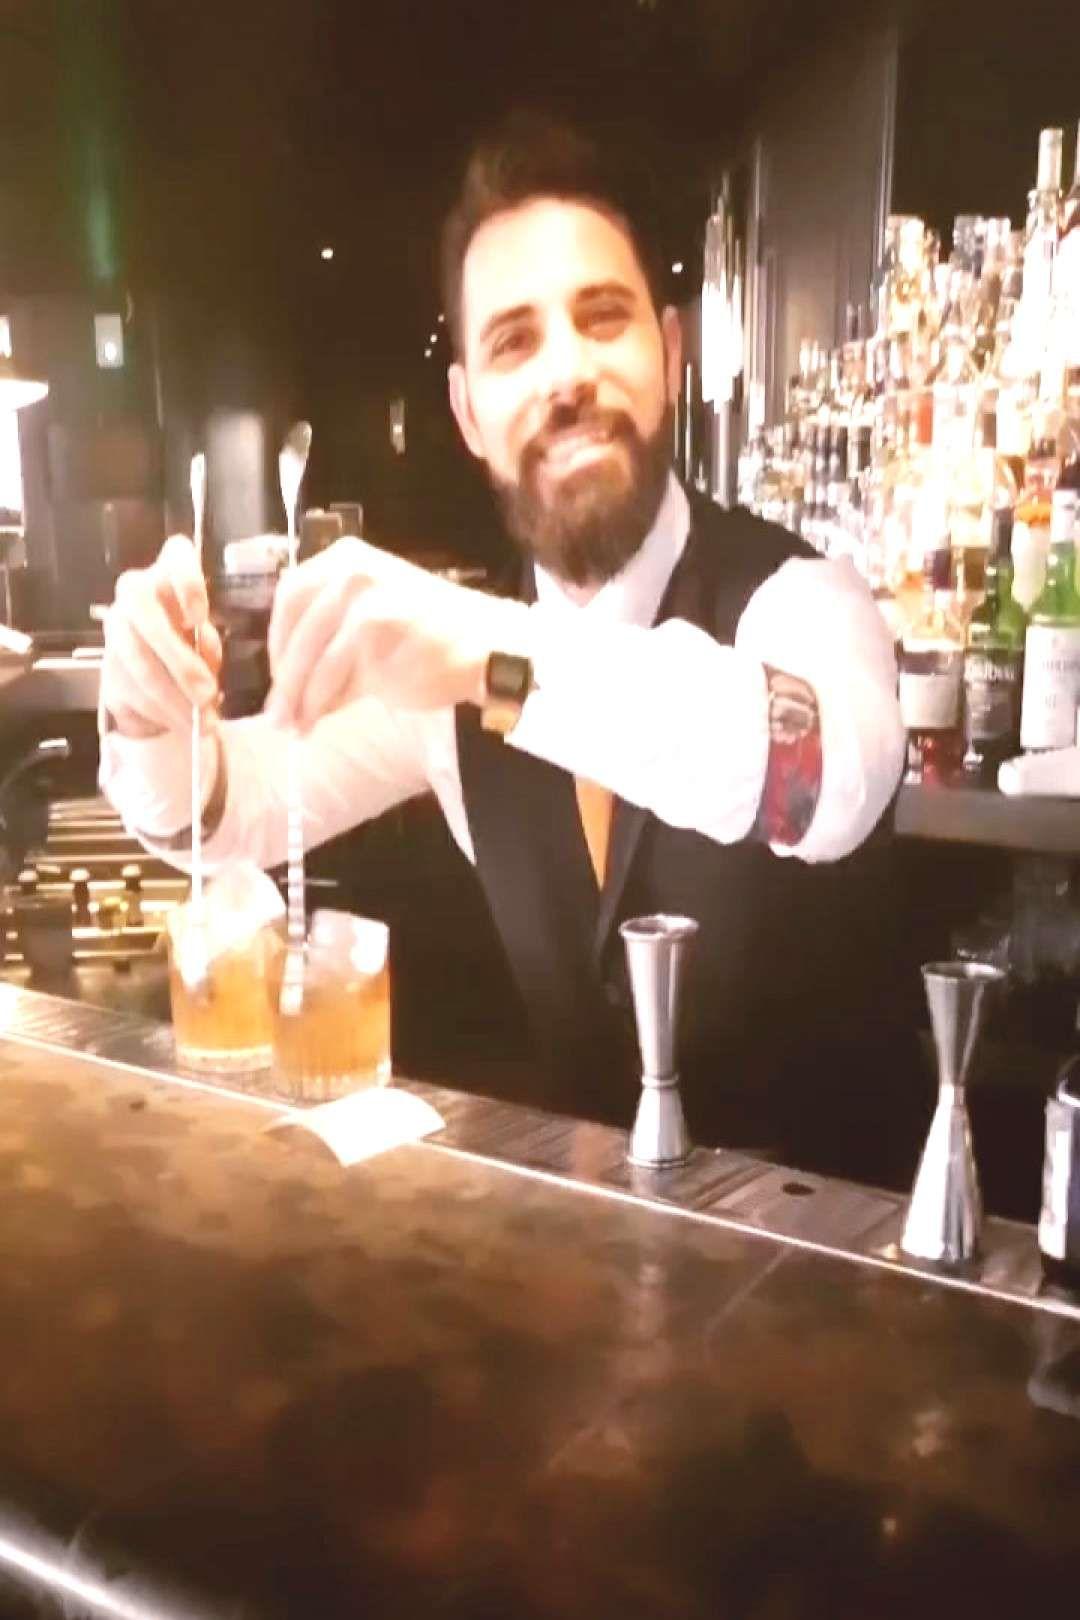 #tipsybartender #bartenders #bartender #february #today #world #every #the #day #is #24